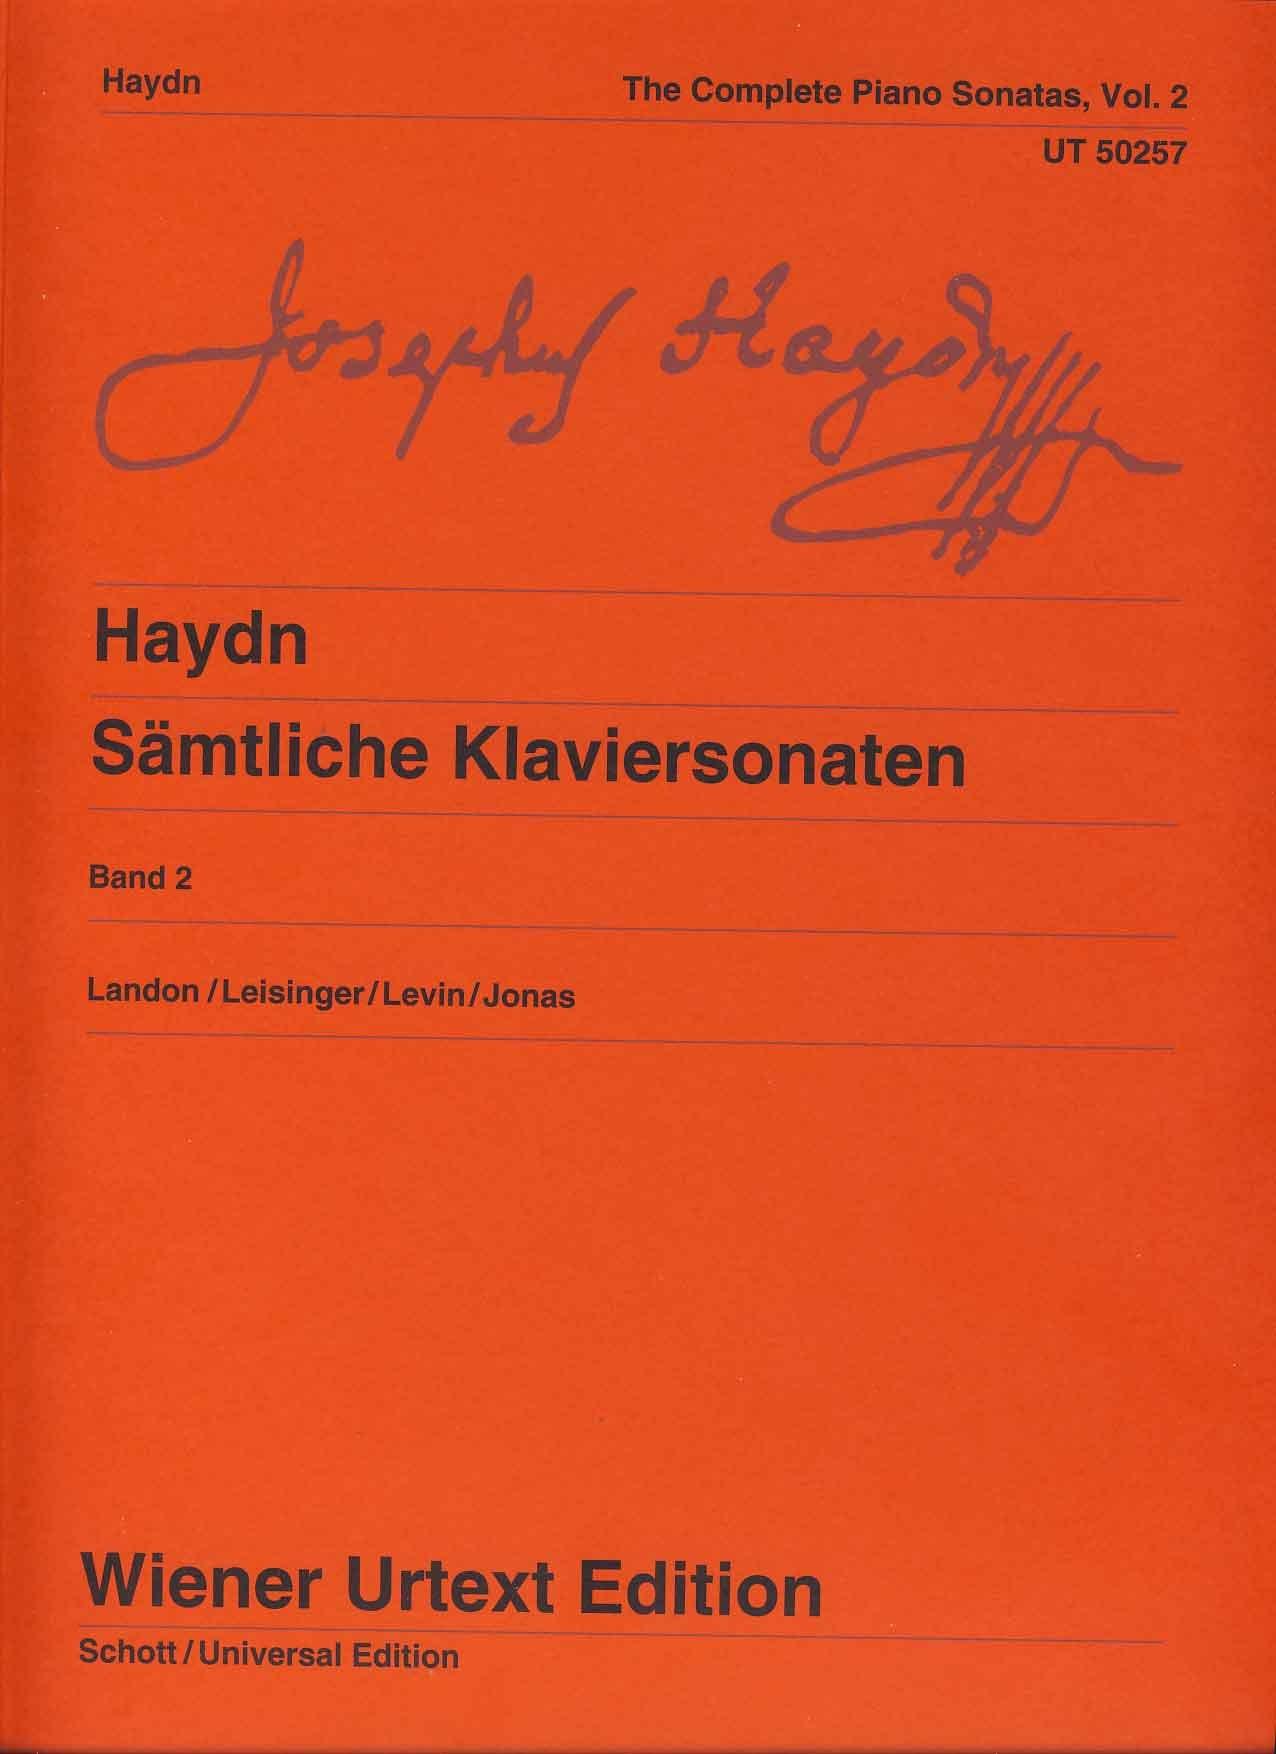 HAYDN COMPLETE PIANO SONATAS 4 Landon Leisinger